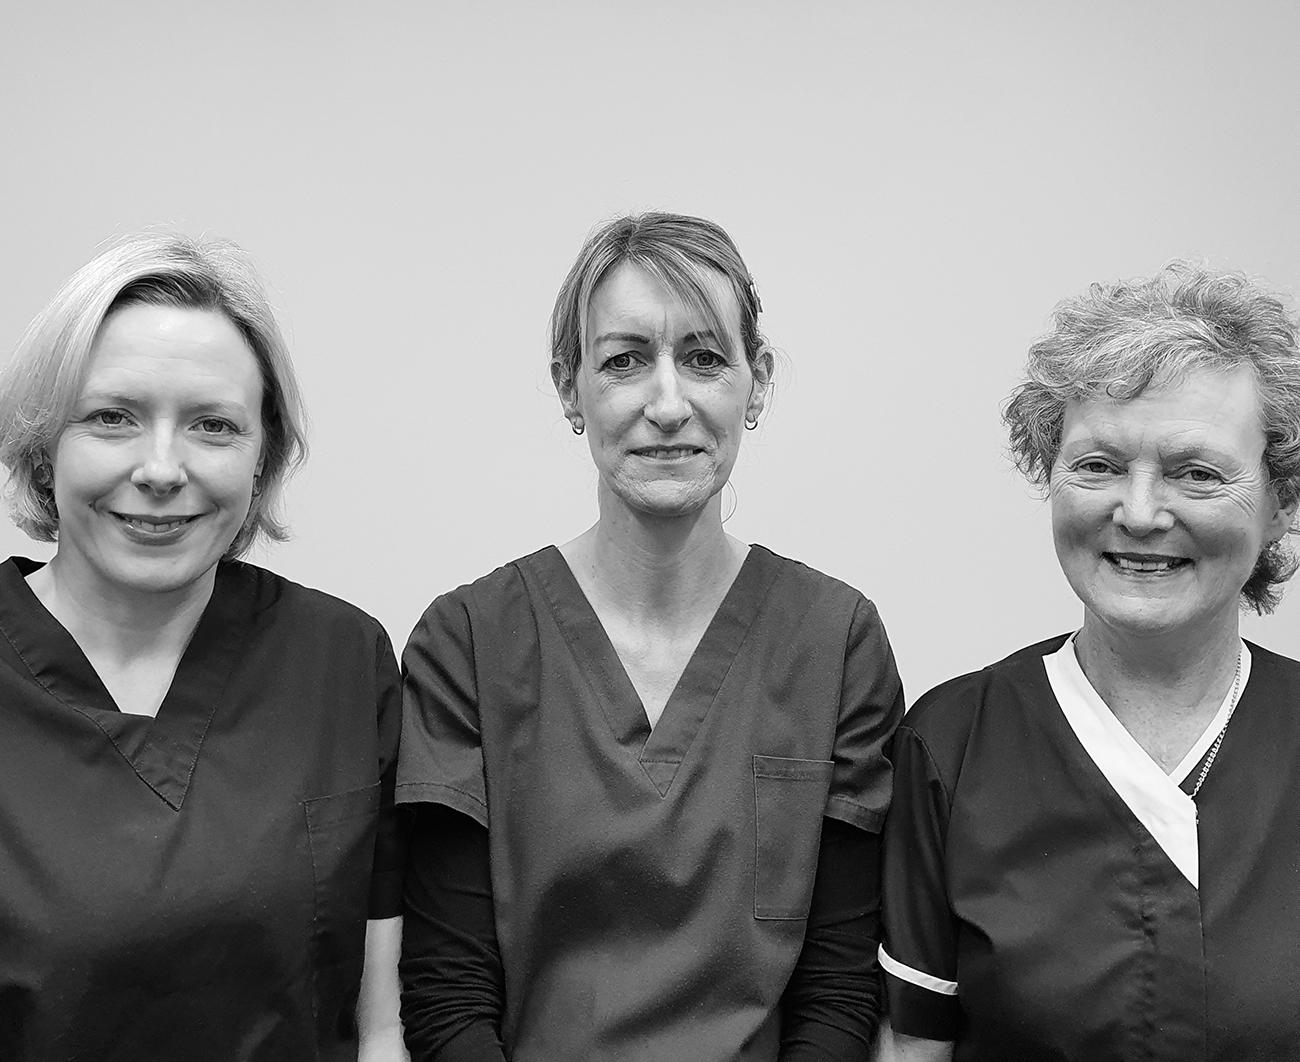 Nurses Elizabeth Beary, Karen Carroll & Nuala O' Connell - Mary Street Medical Centre